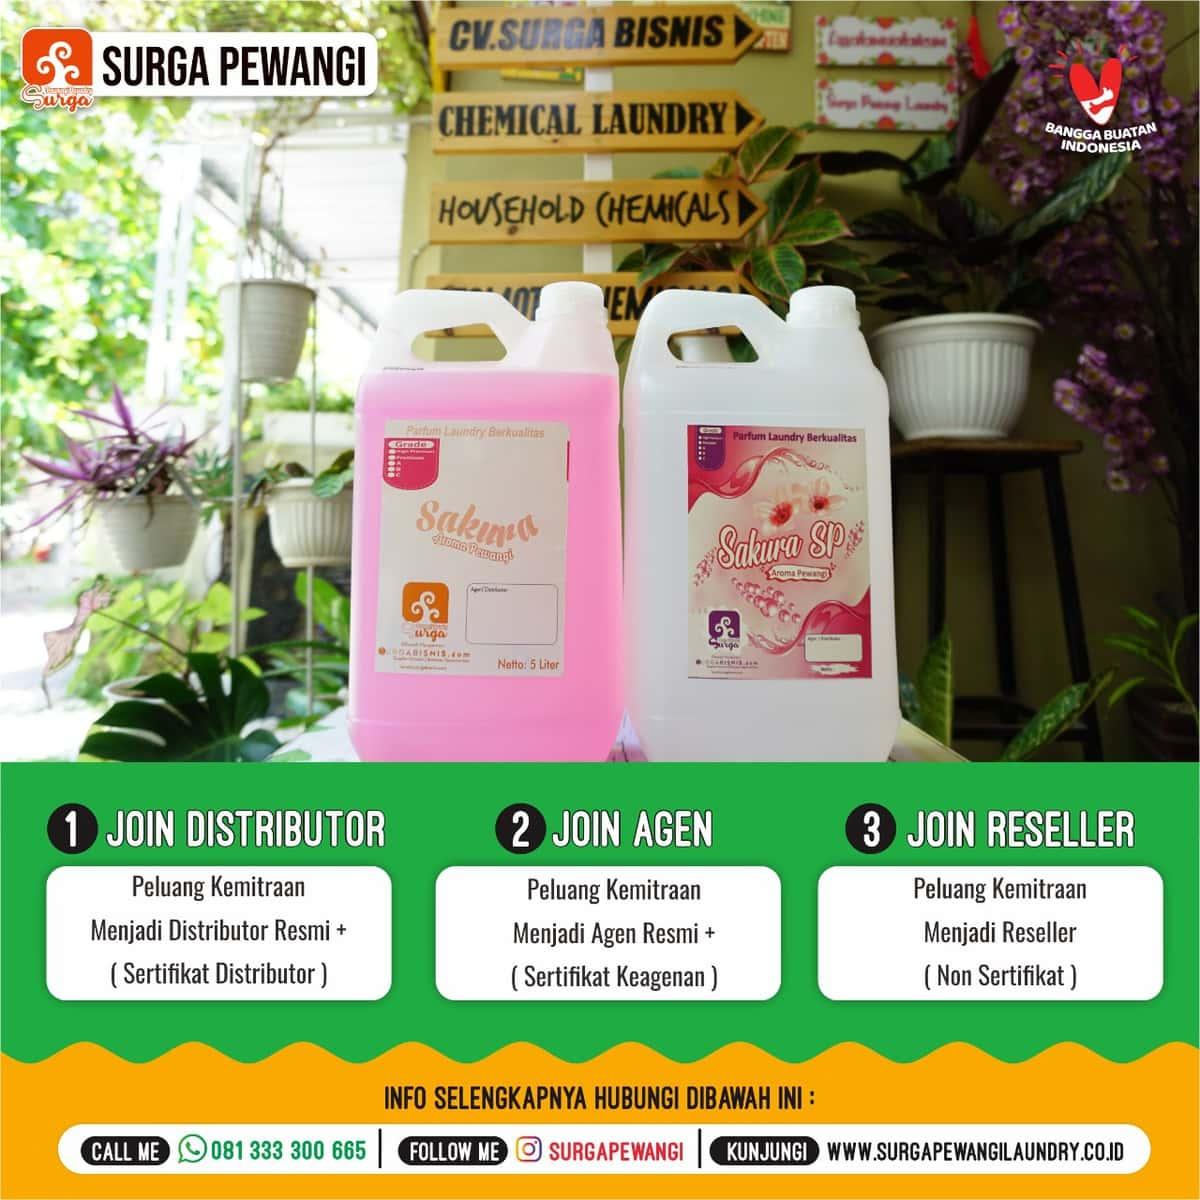 df7d4790 0a27 47dd 861b 87dc09d398f1 - Produsen Parfum Laundry Buah Baunya Segar Banget !!